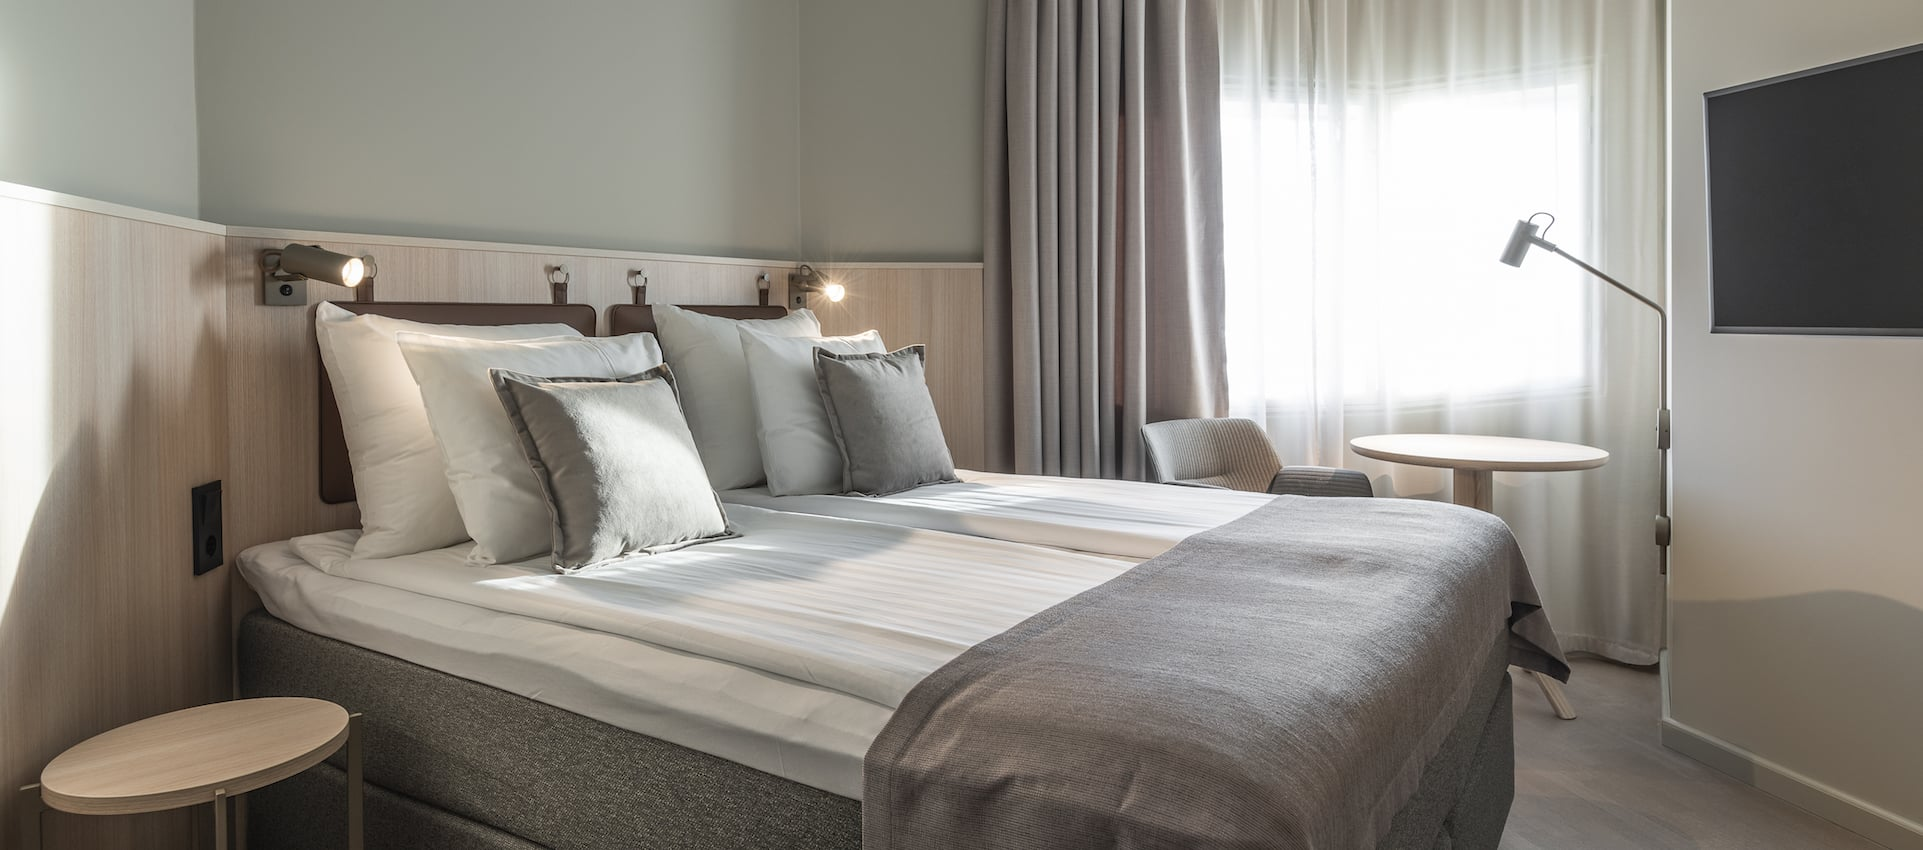 hotel-room-standard-quality-hotel-arlanda-xpo_1920x850